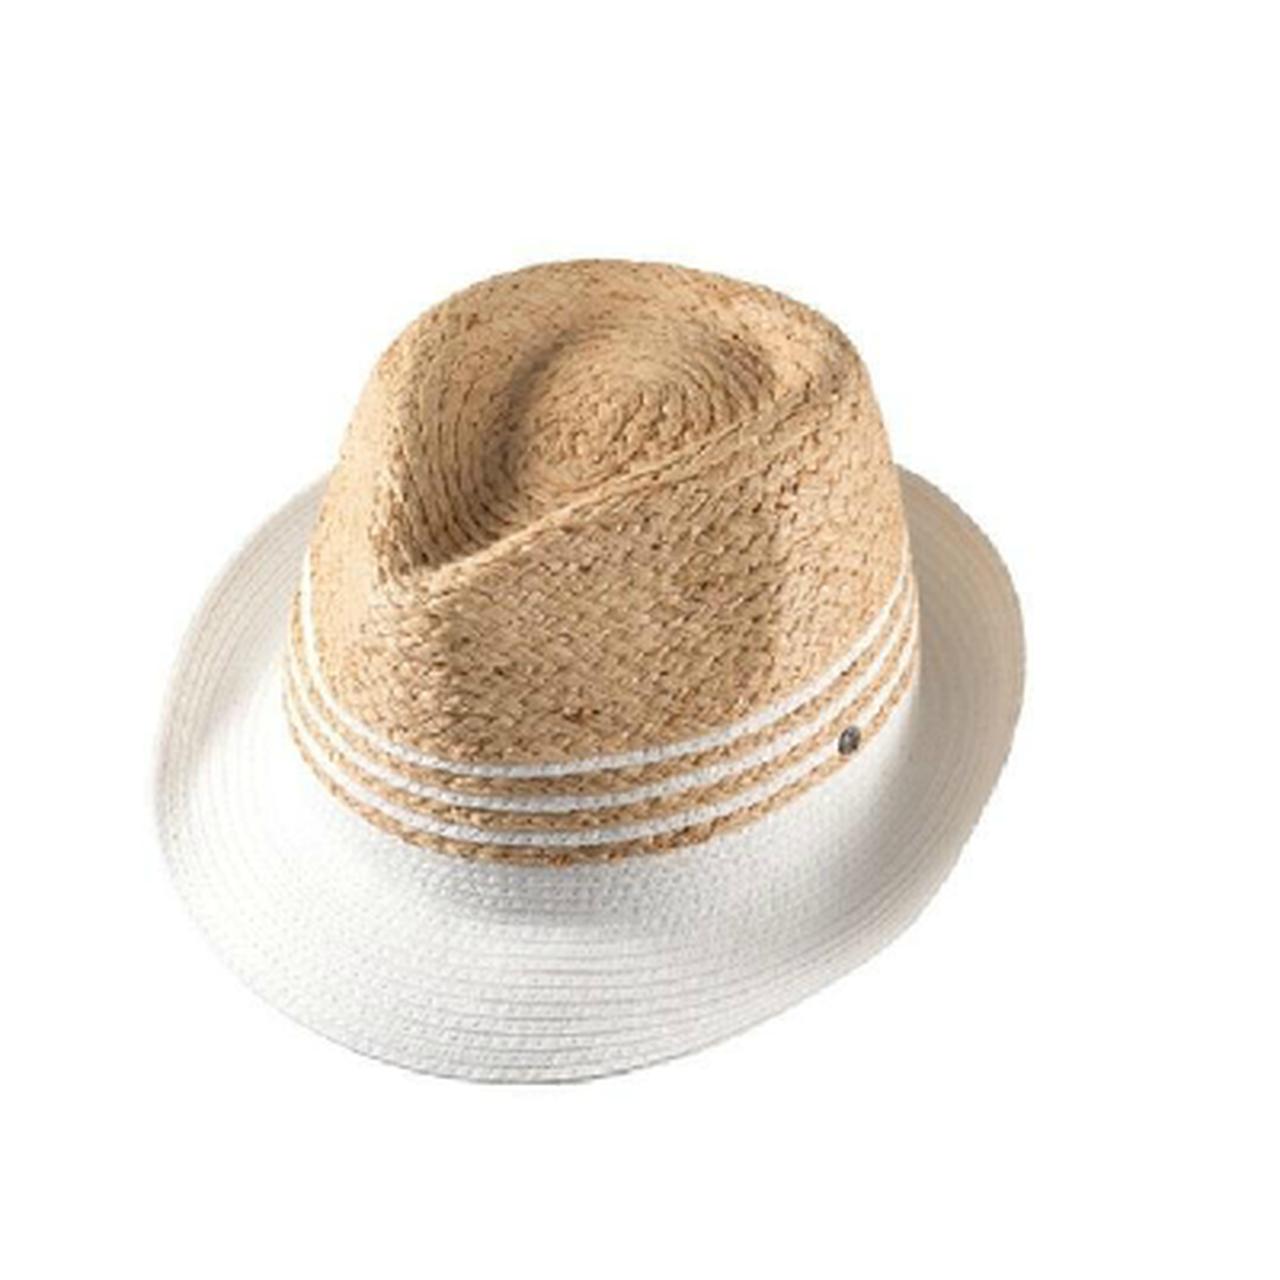 Kooringal Fedora Jordan Hat